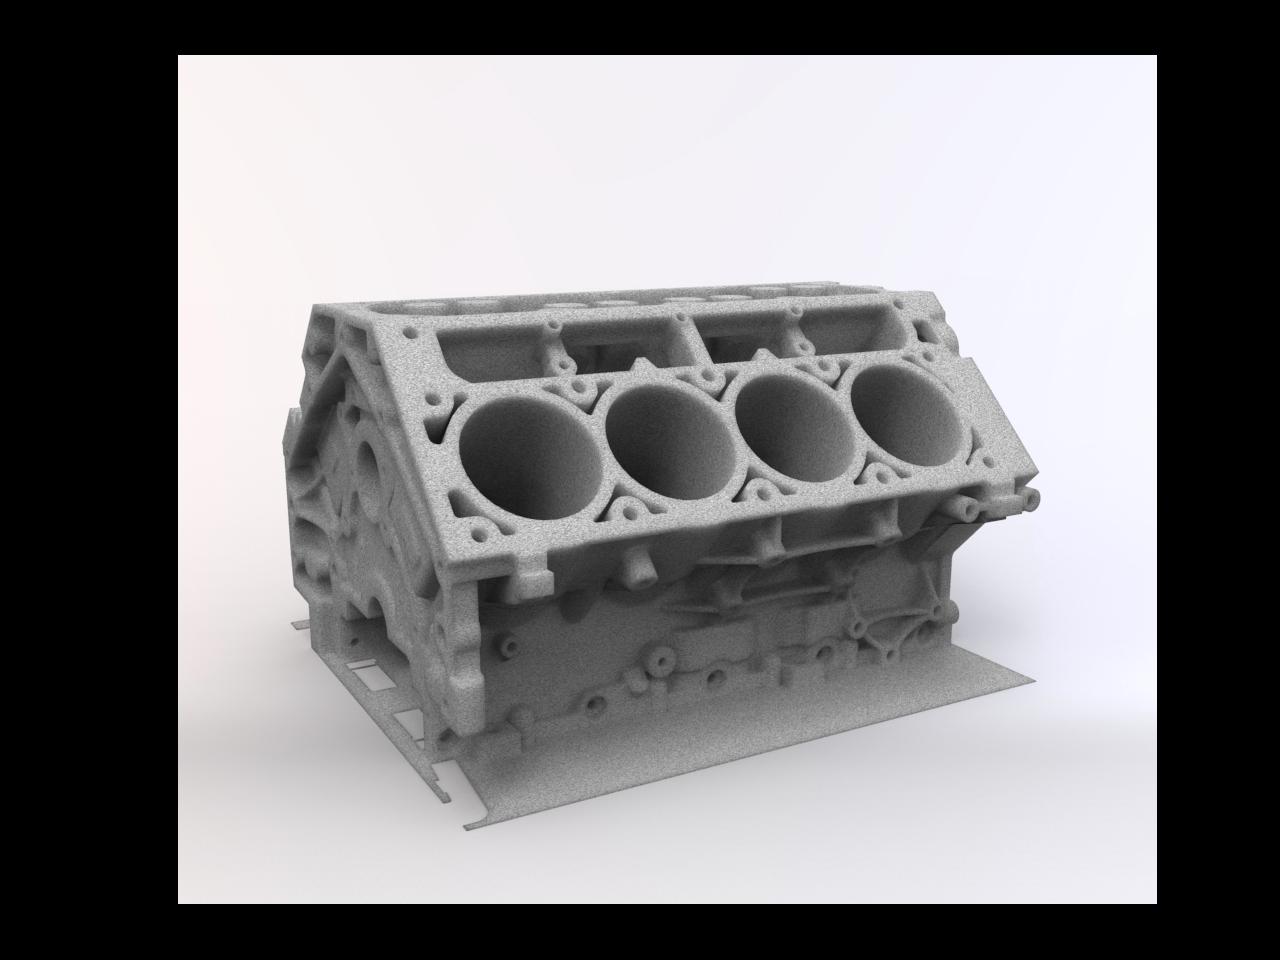 3dprint 3d print motor